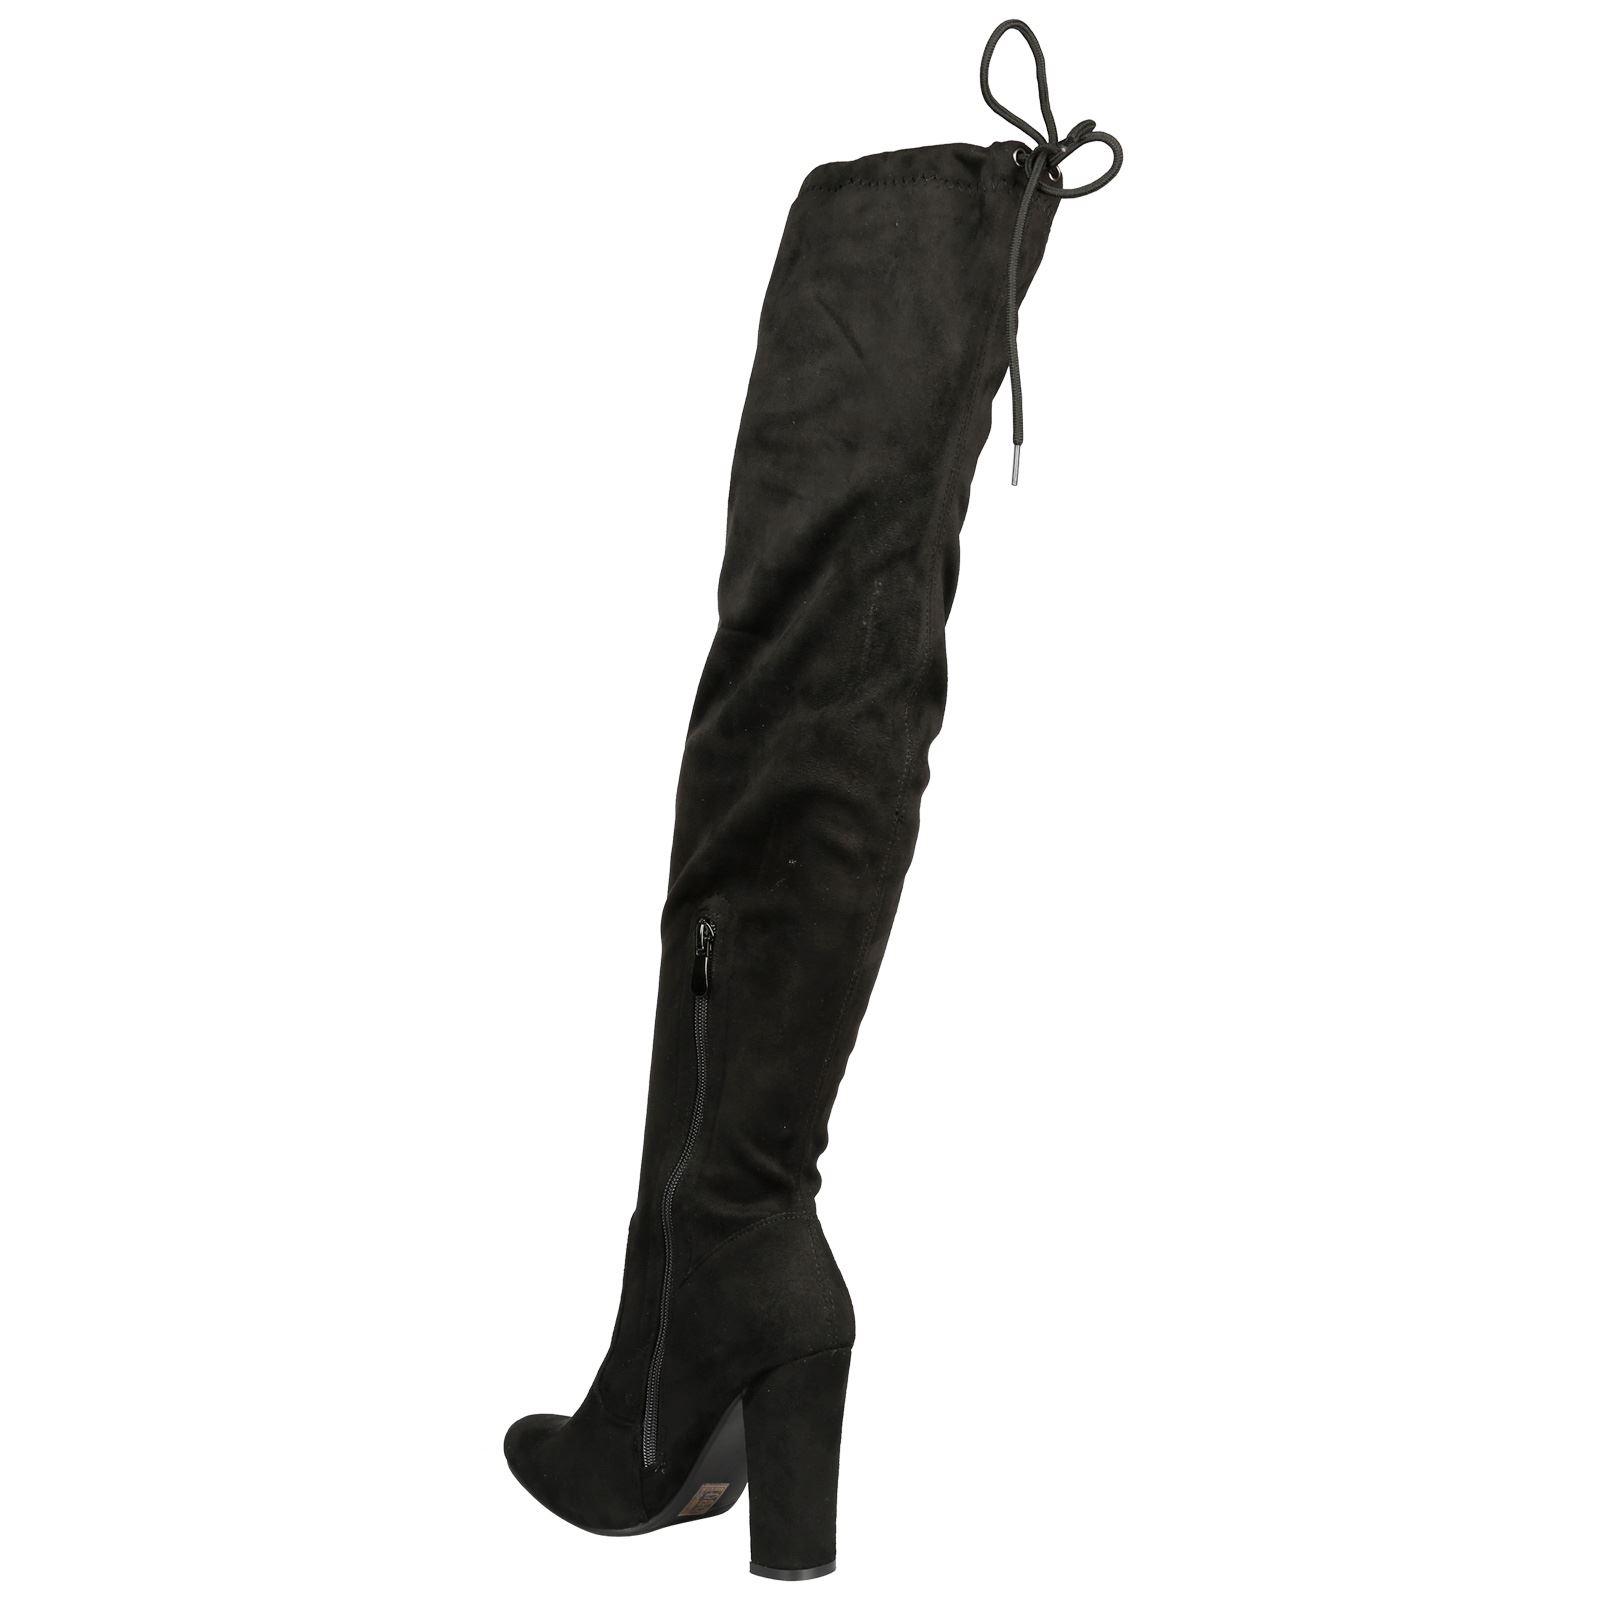 Iliana-Womens-Knee-High-Zip-Up-Adjustable-Pull-Strings-Mid-High-Block-Heel-Boots thumbnail 5